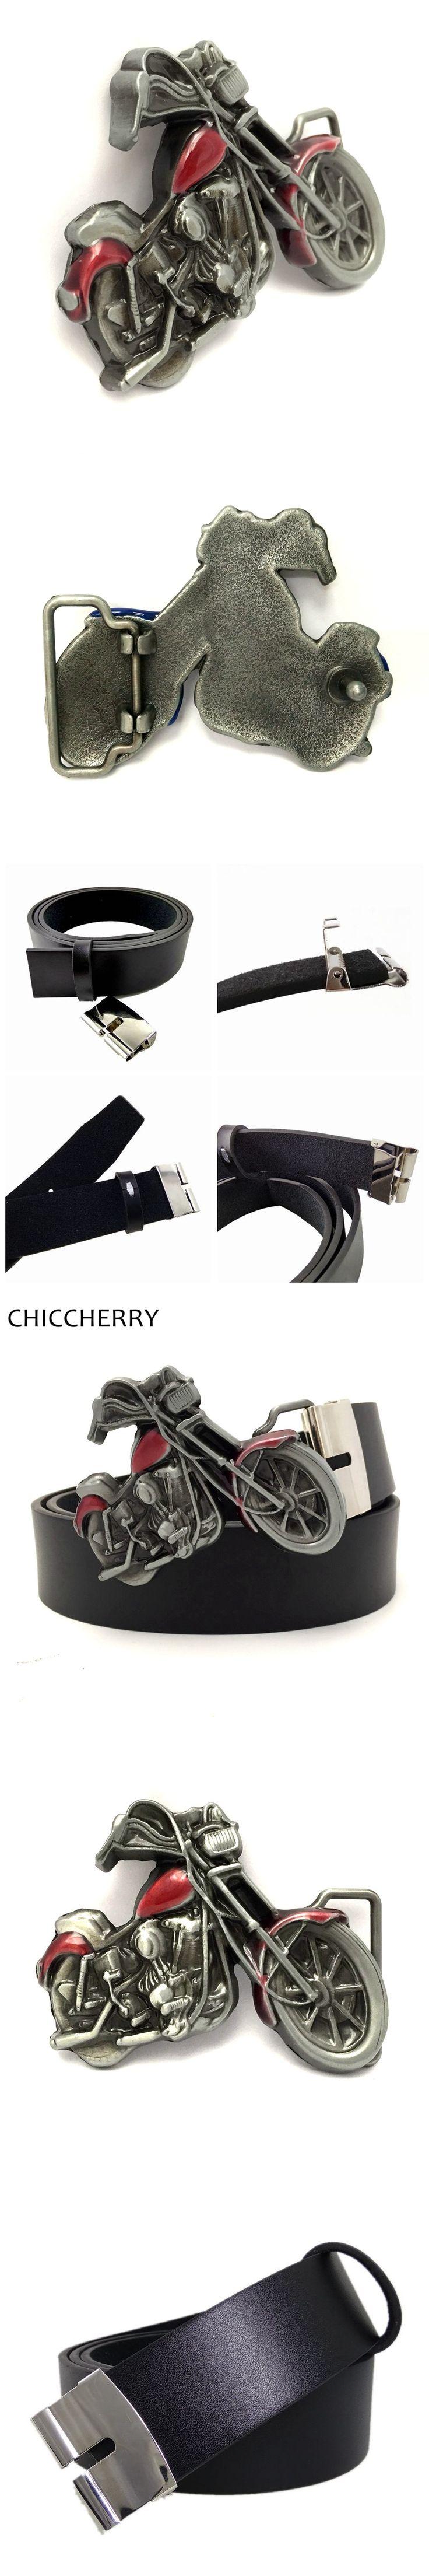 New Fashion Mens Designer Jeans Cool Belts 3D Motorcycle Metal Belt Buckles For Men Punk Fivelas Cowboy Cinto Ceinture Masculino